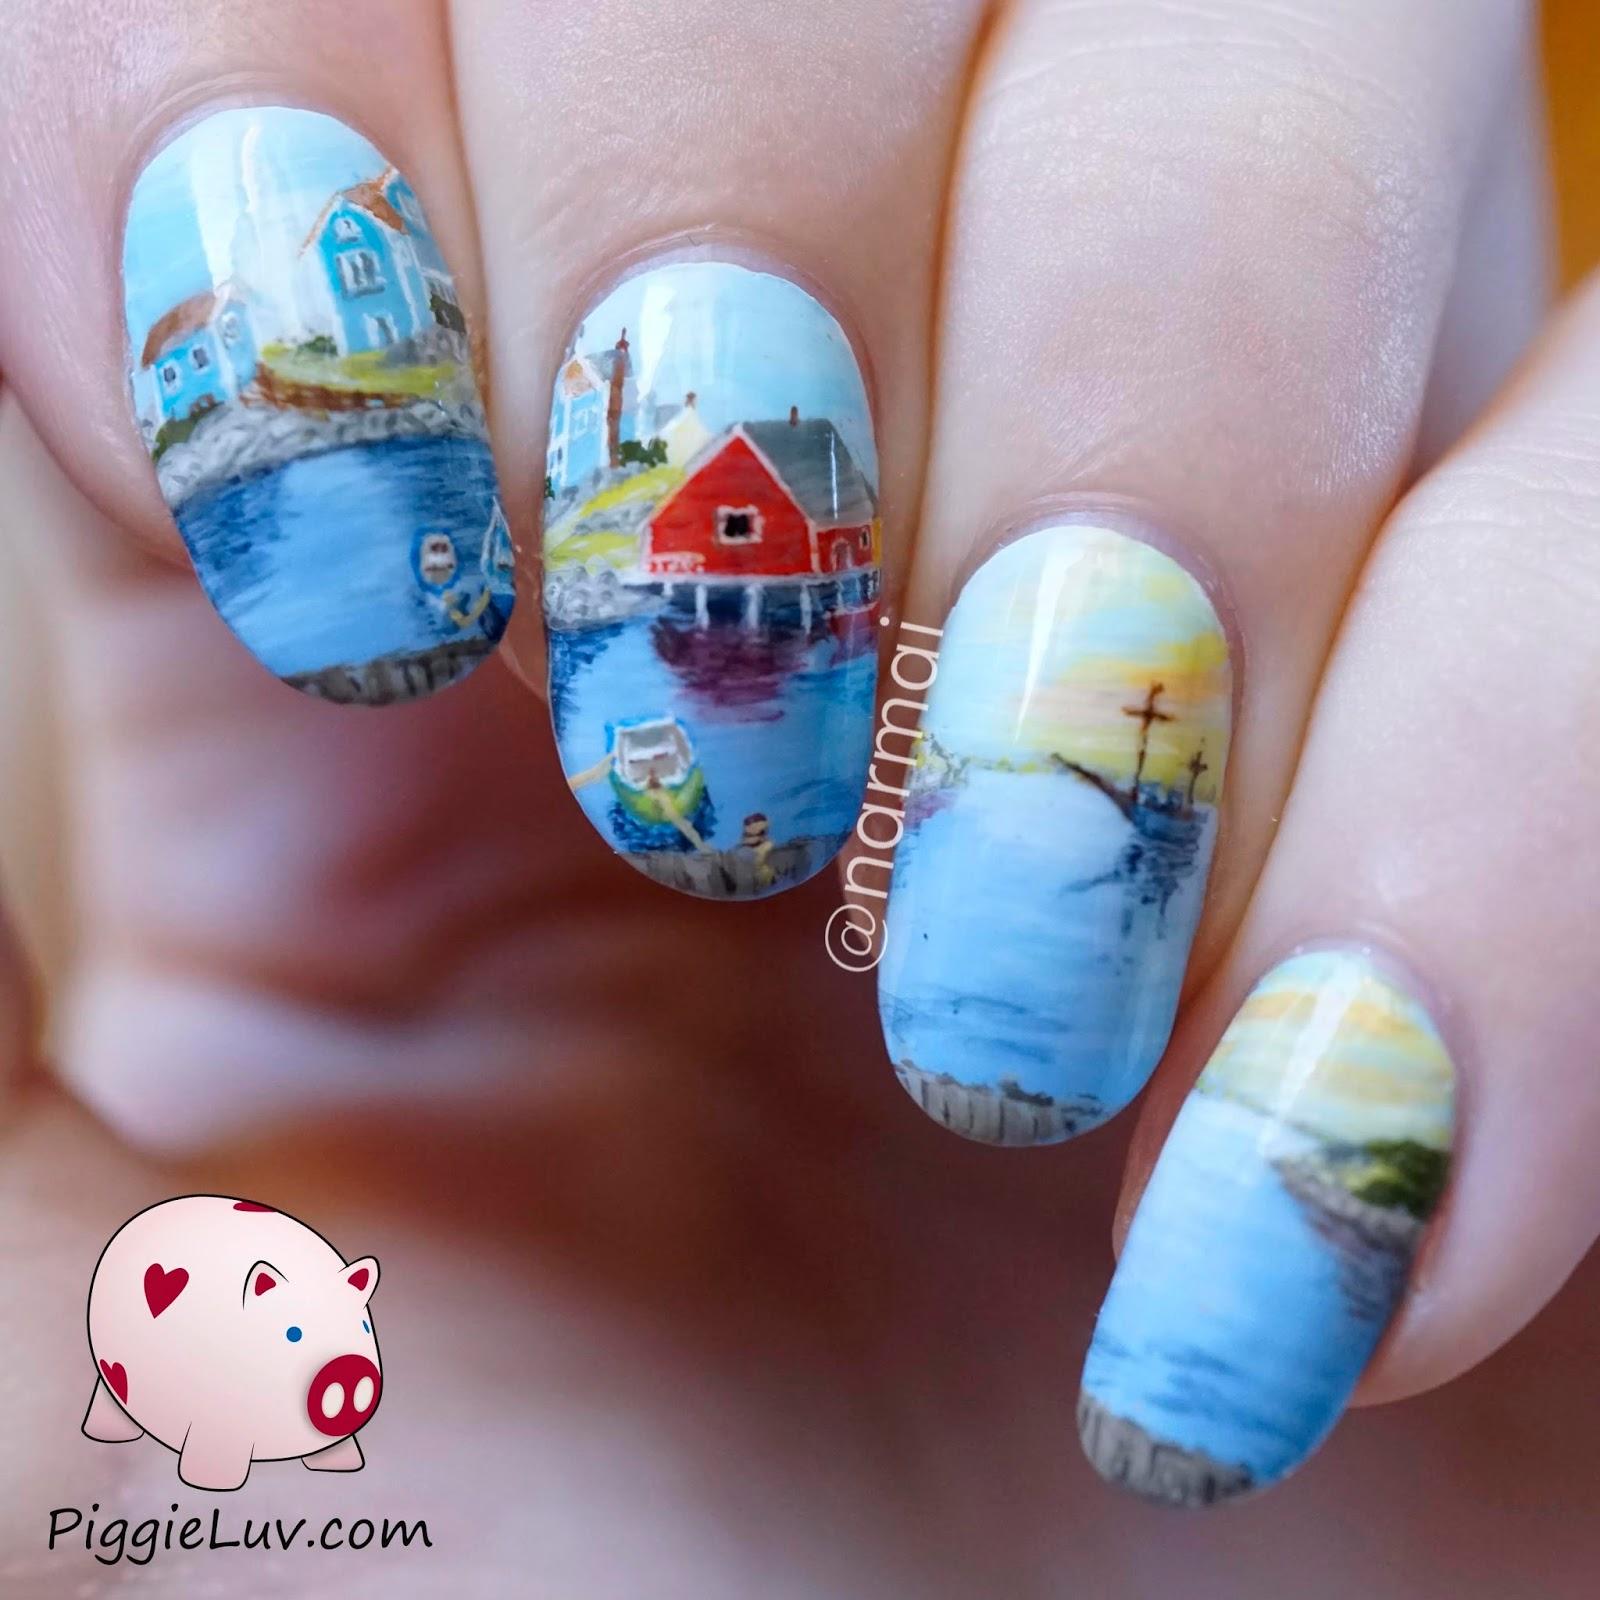 PiggieLuv: Peggy\'s Cove, nail art inspired by Raymond Edmonds